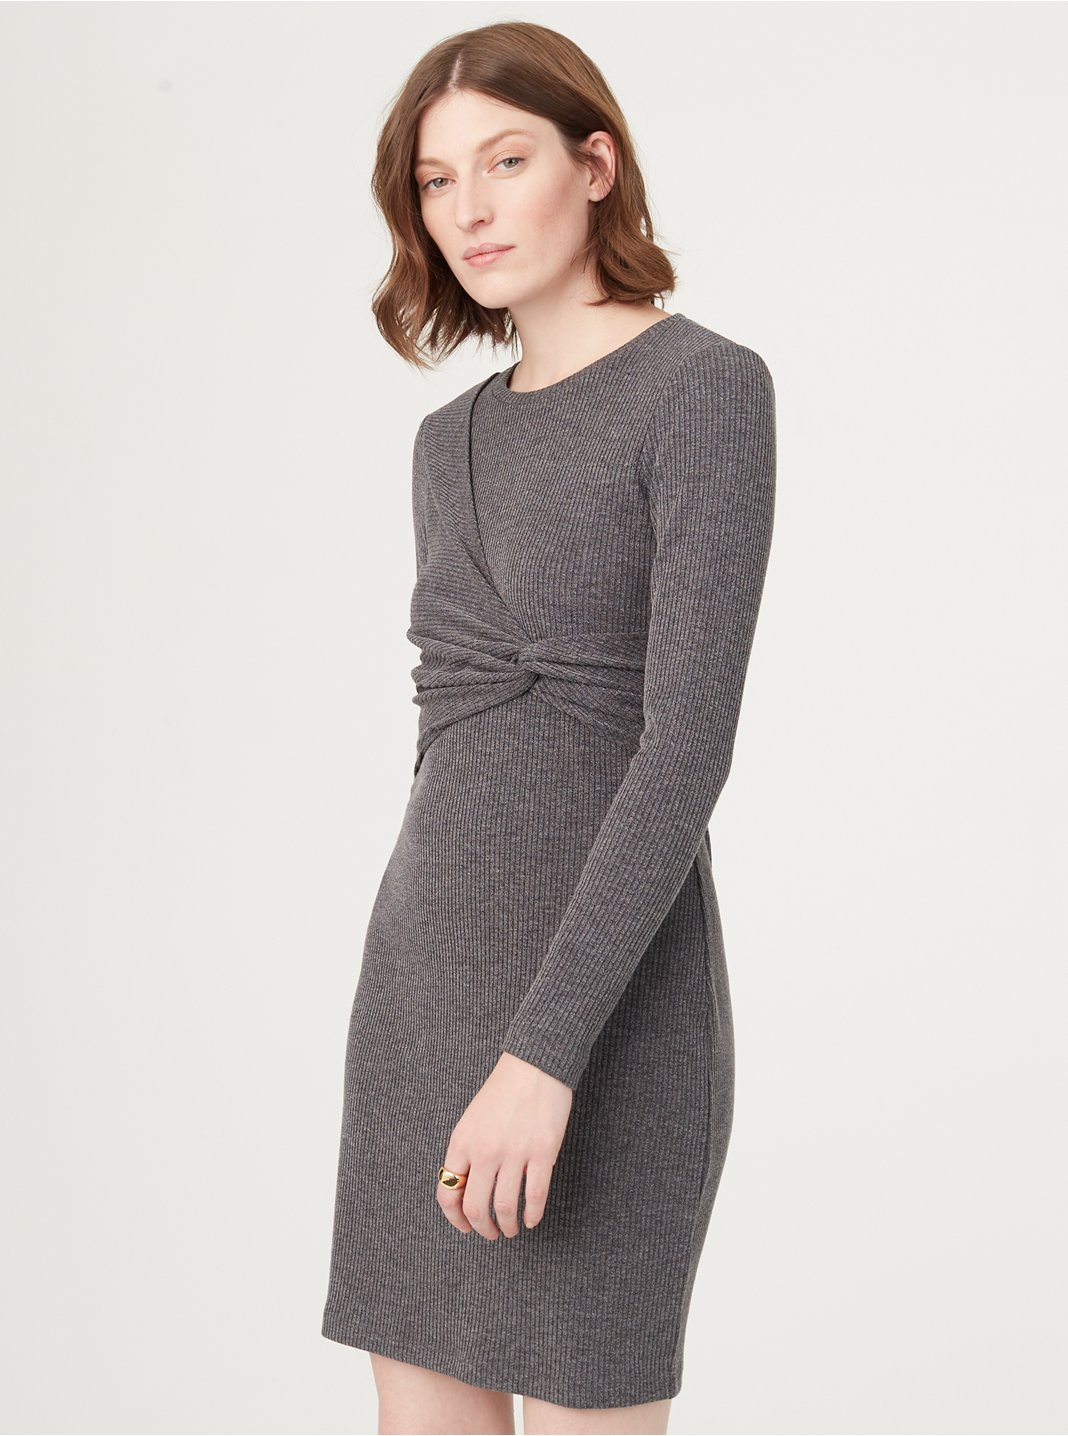 Seleen Knit Dress